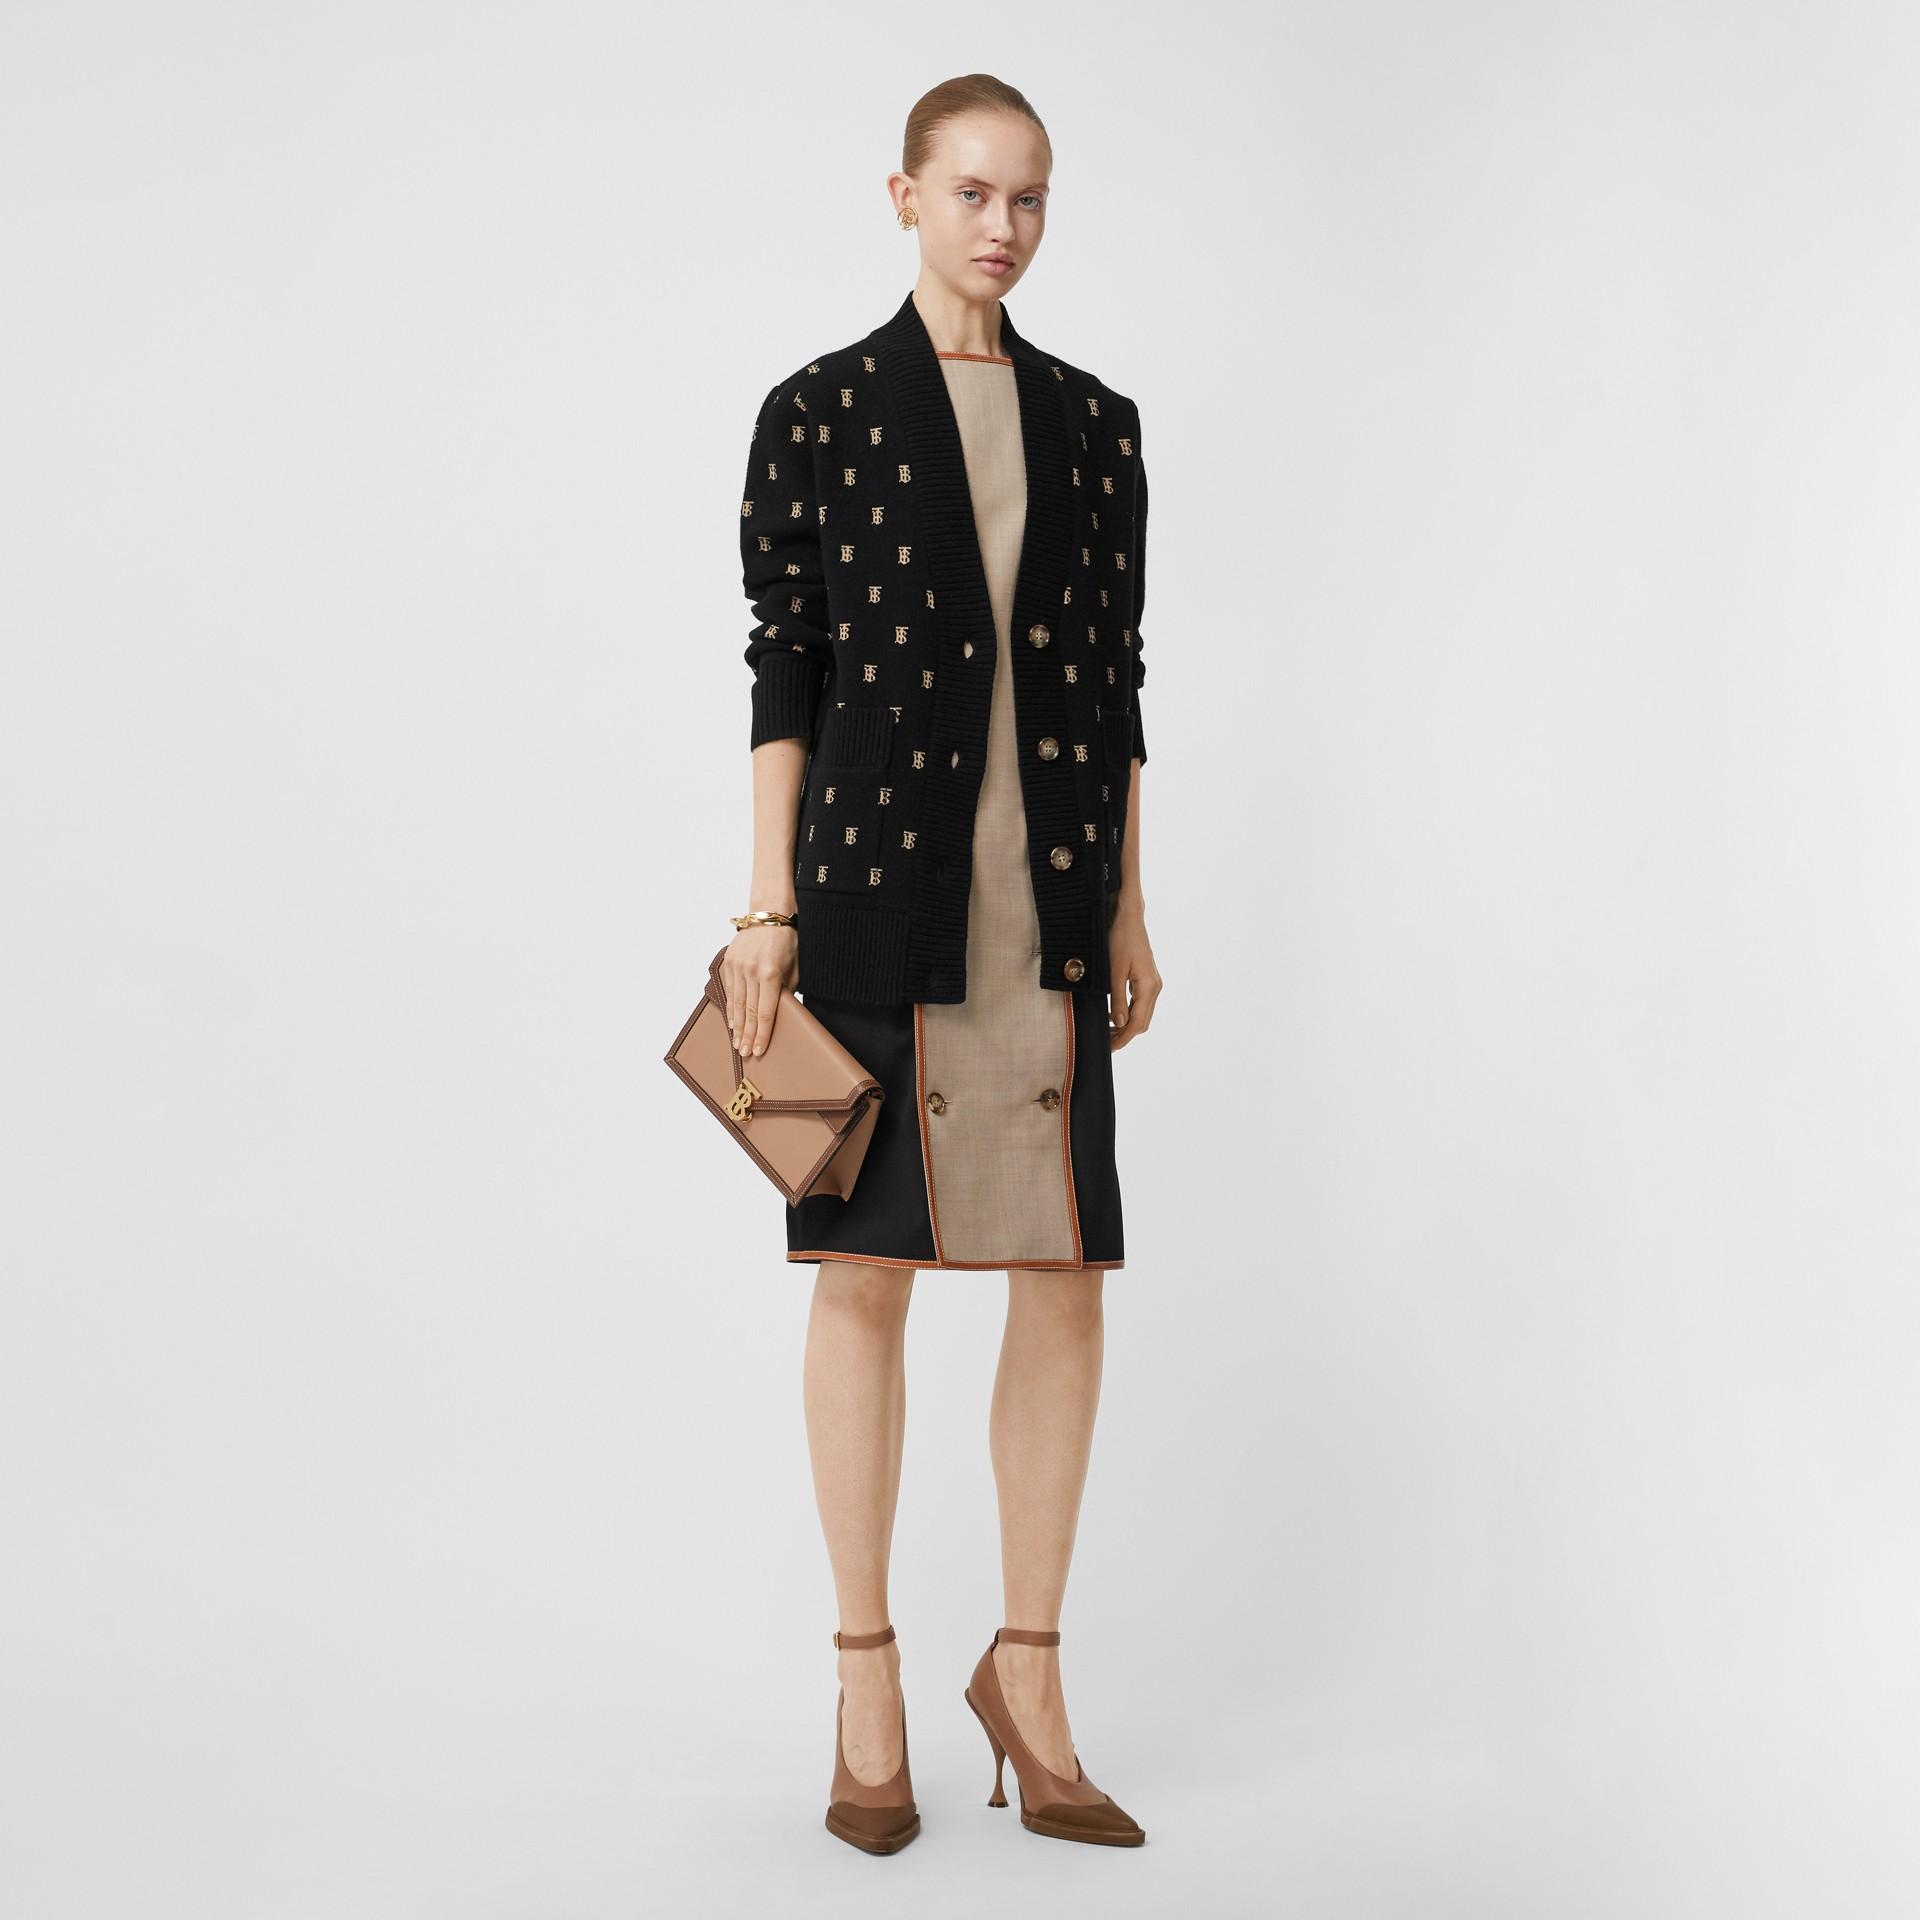 Monogram Wool Cashmere Blend Oversized Cardigan in Black - Women | Burberry - gallery image 5